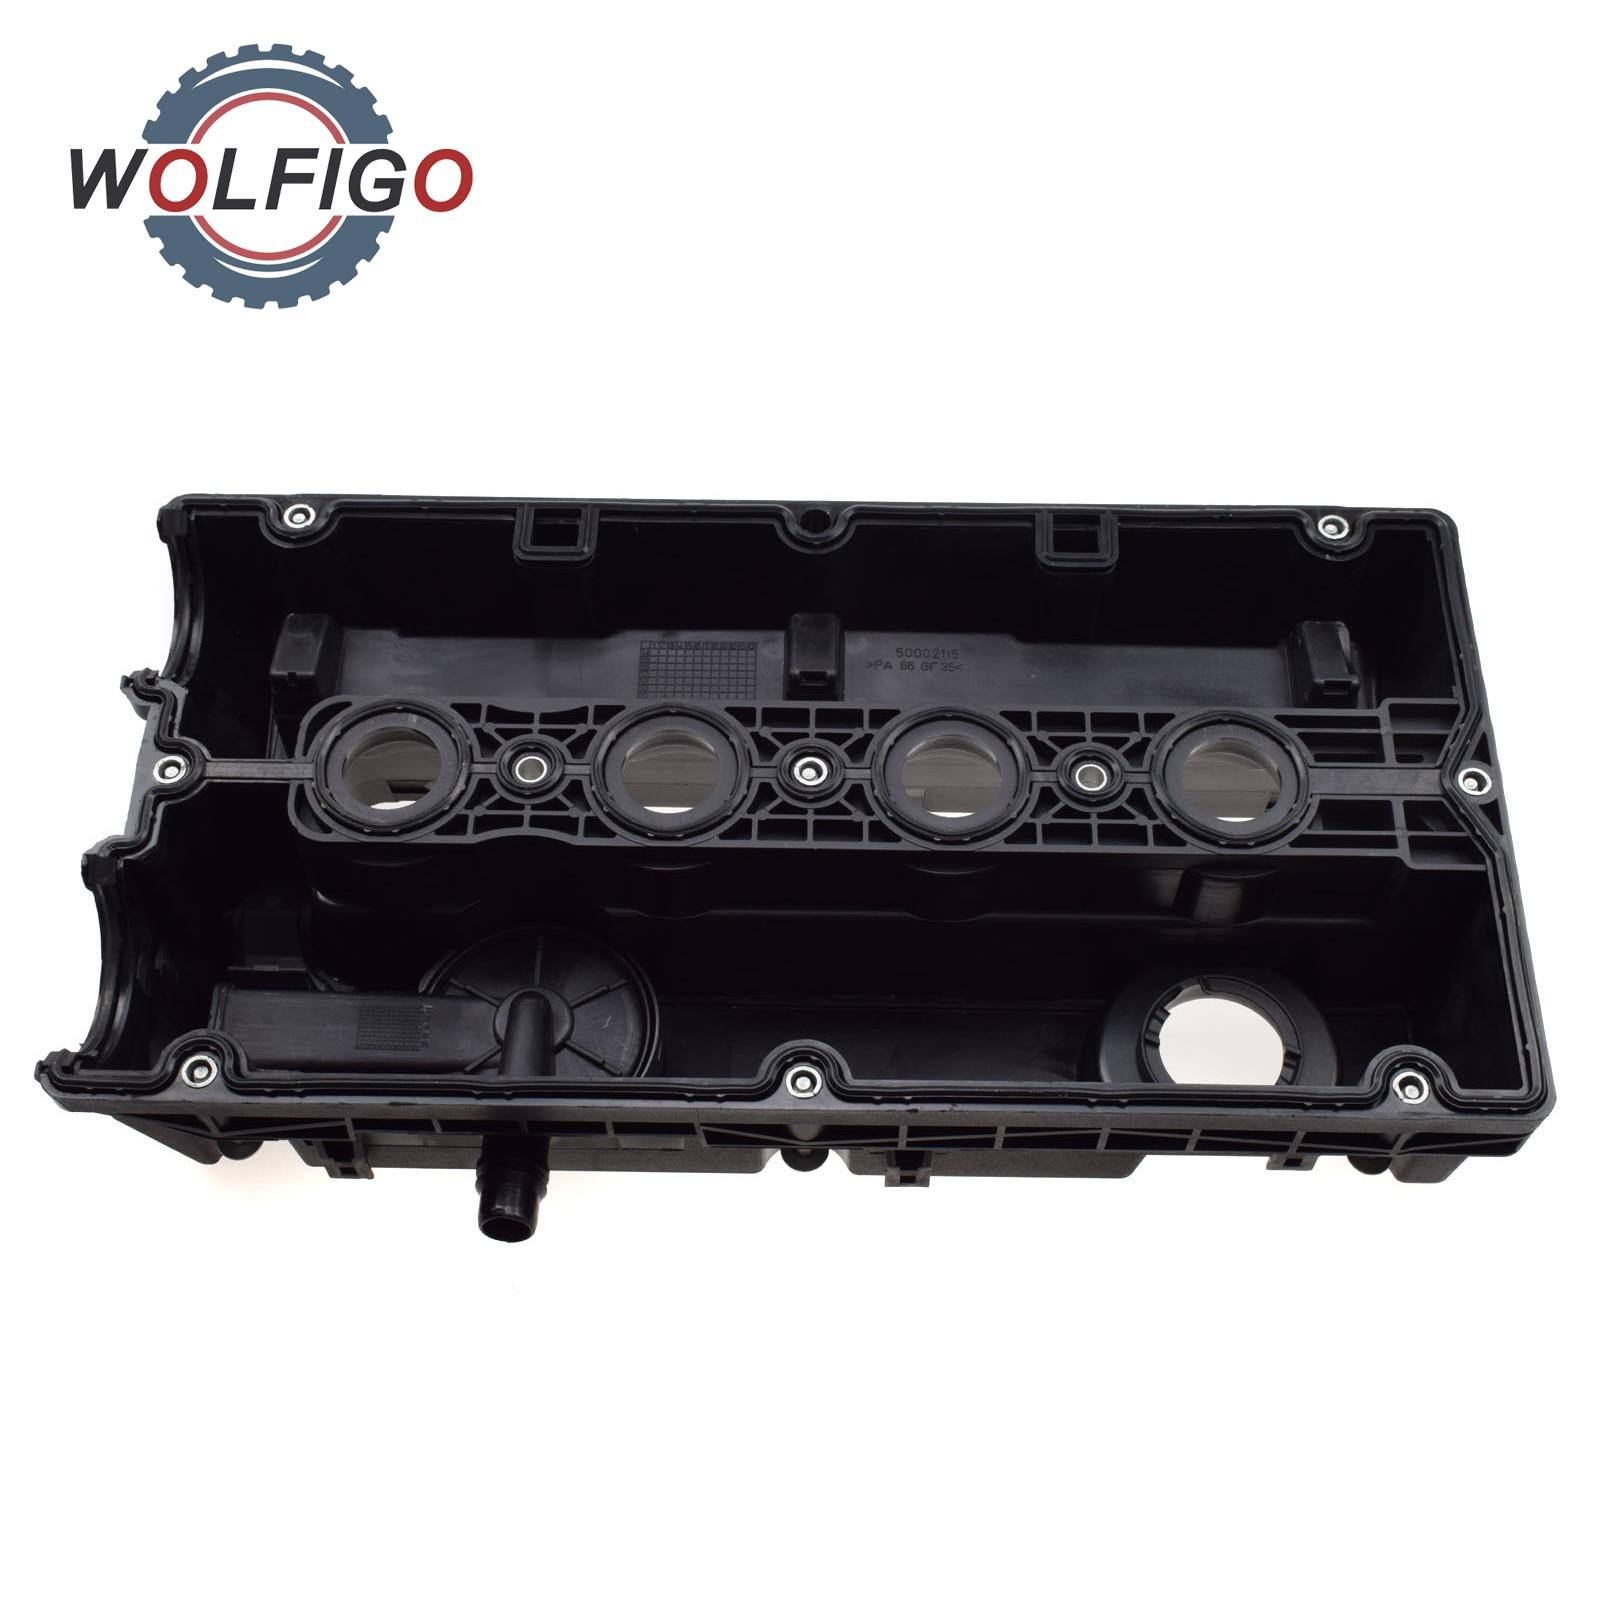 hight resolution of wolfigo cam rocker engine valve cover z16xep 1 6l 55556284 5607159 for vauxhall astra g mk4